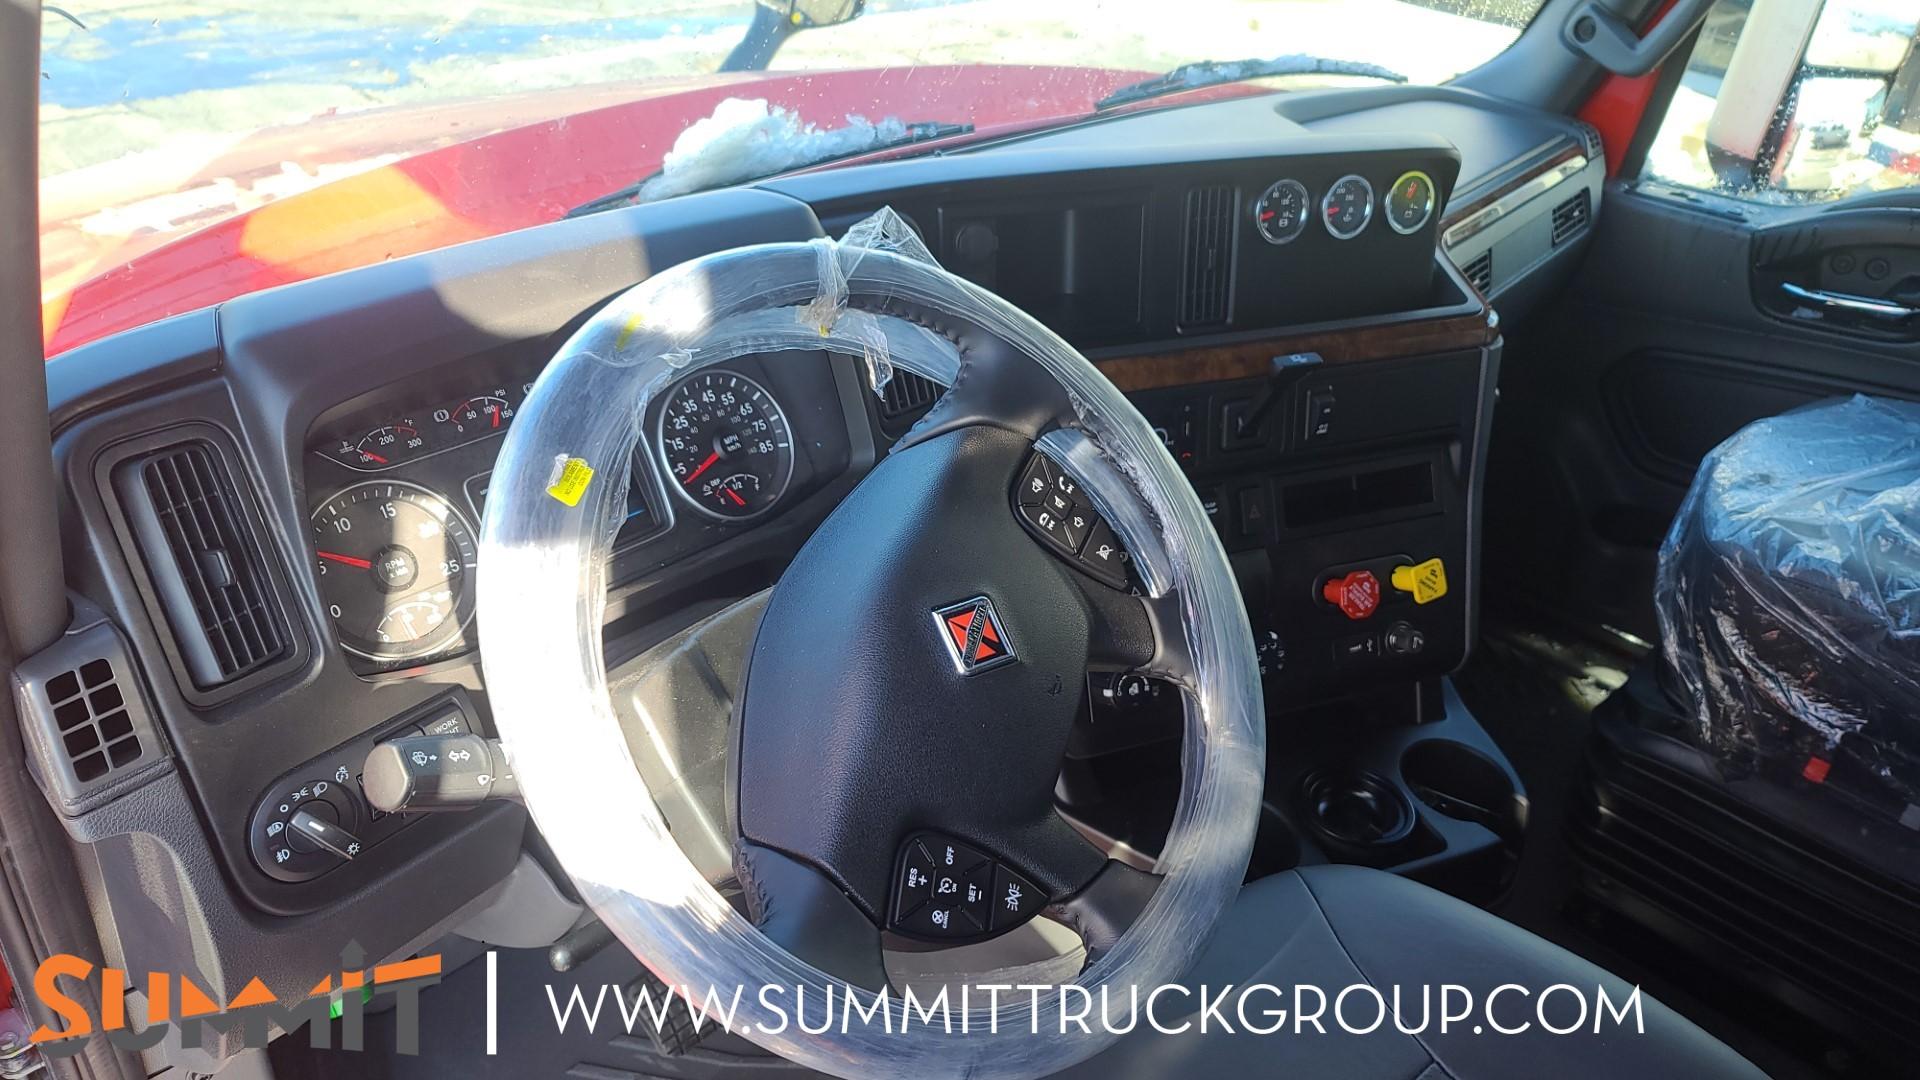 2021 International LT Sleeper Cab 6x4, Tractor #MN880645 - photo 1